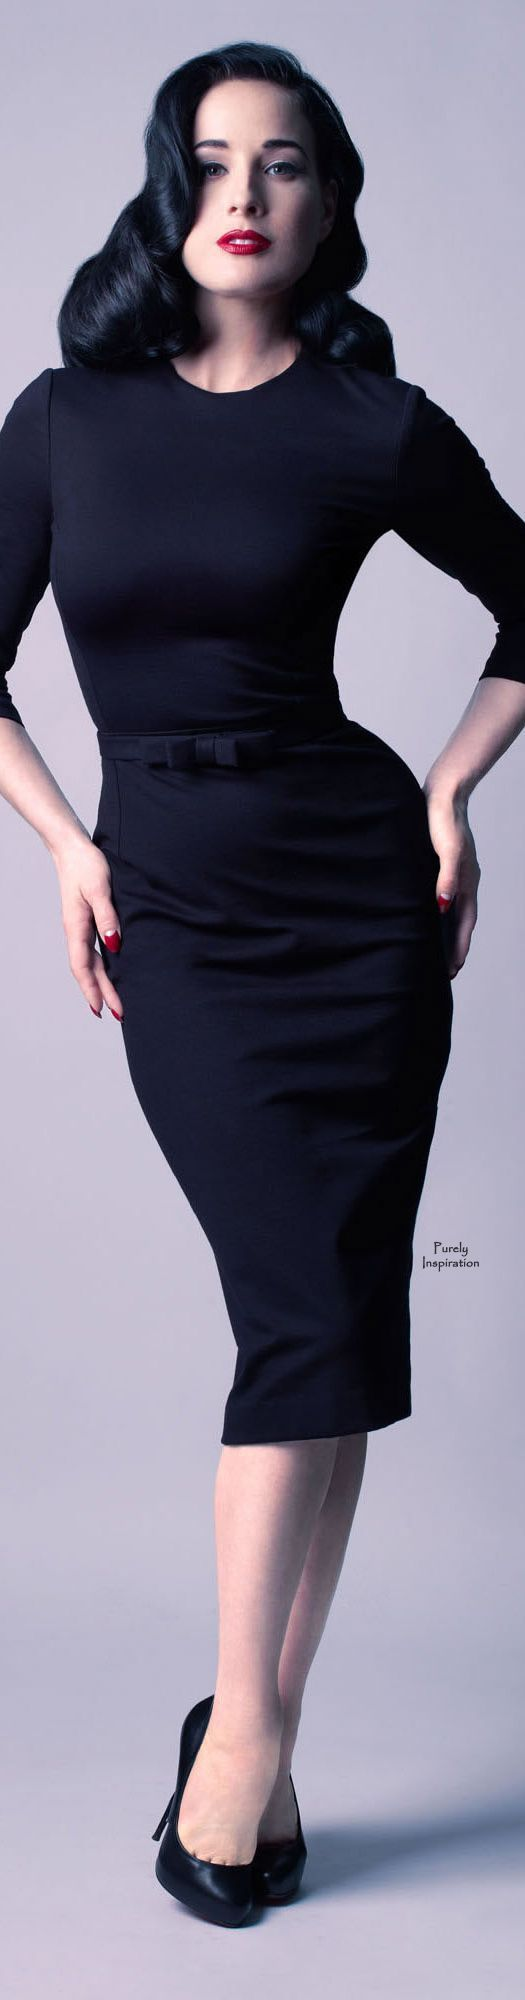 Vintage Style Dita Von Teese   Purely Inspiration